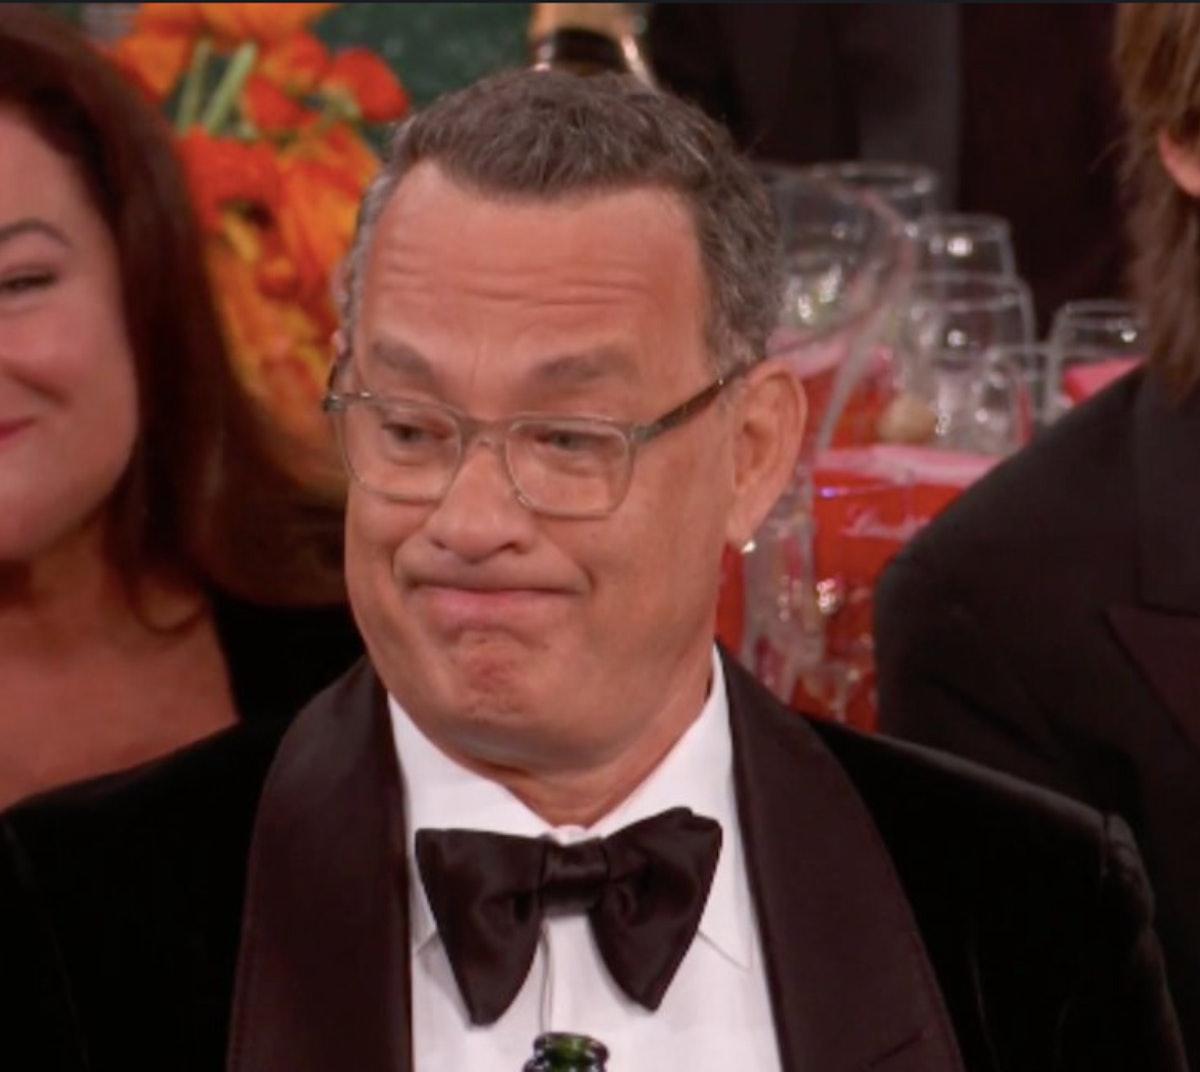 Tom Hanks at the 2020 Golden Globes